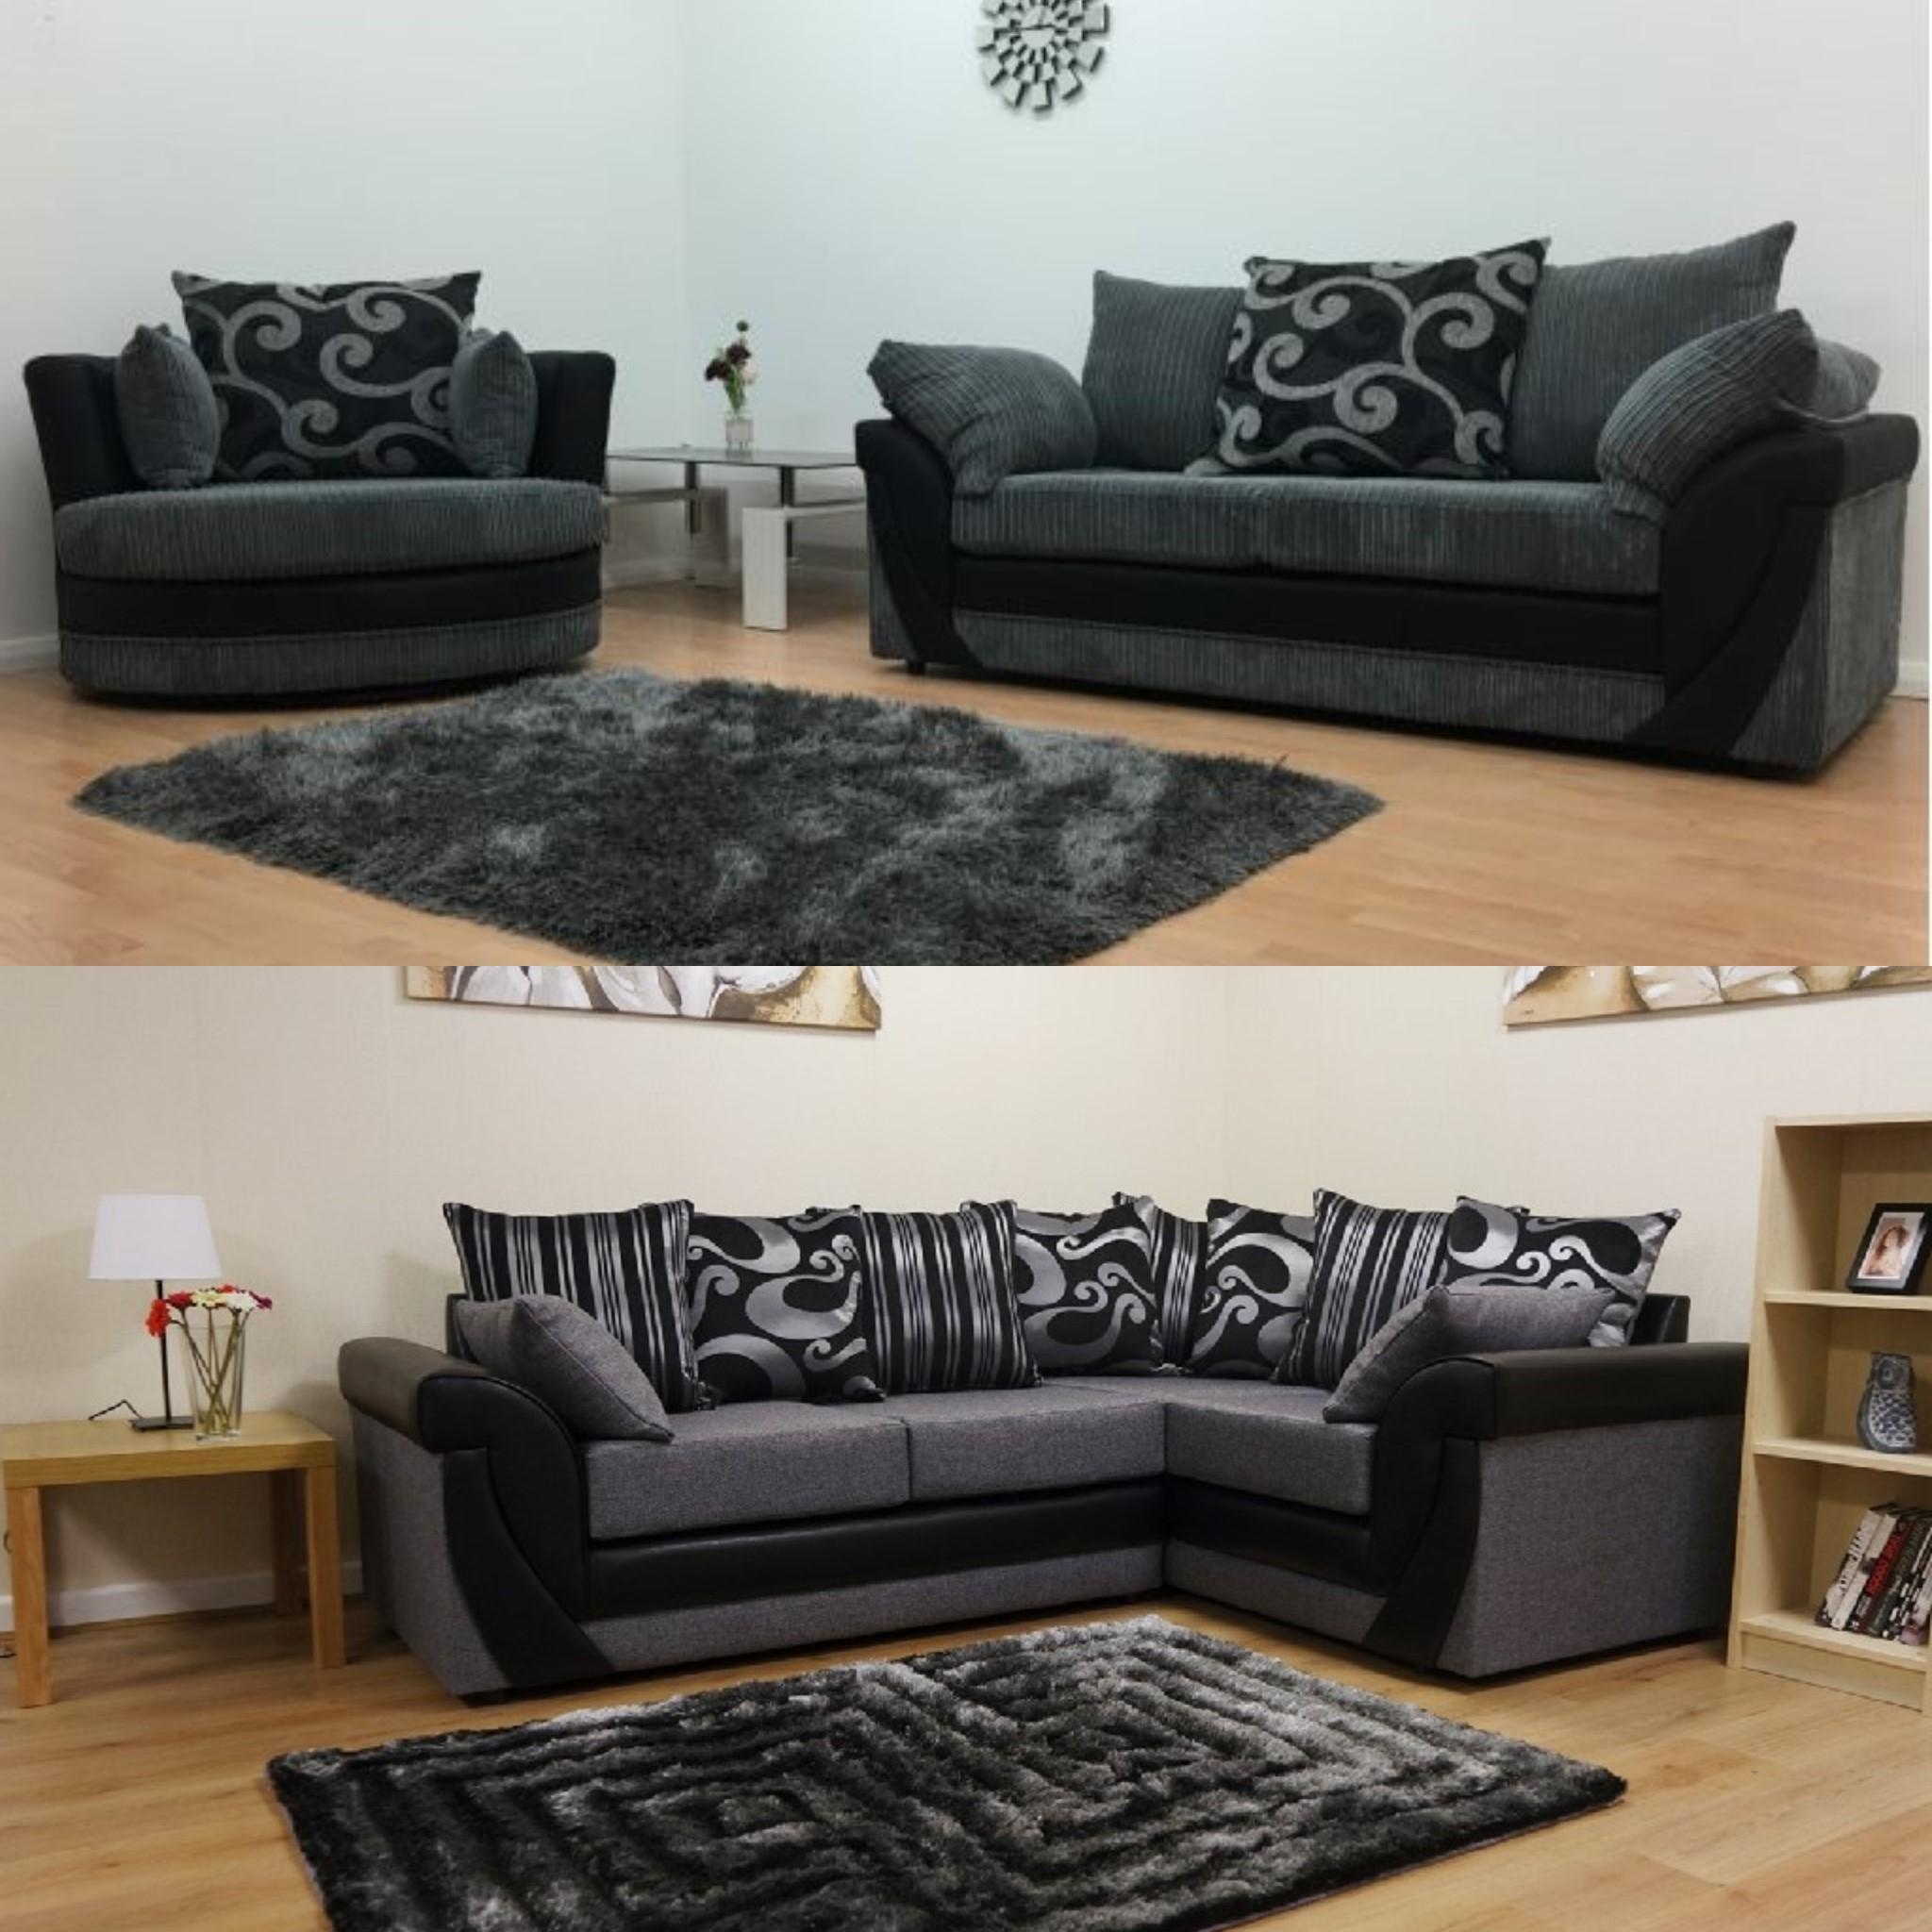 Latest Corner Sofa And Swivel Chairs In Lush Fabric Corner Sofa Set – Sofastorm (View 13 of 20)